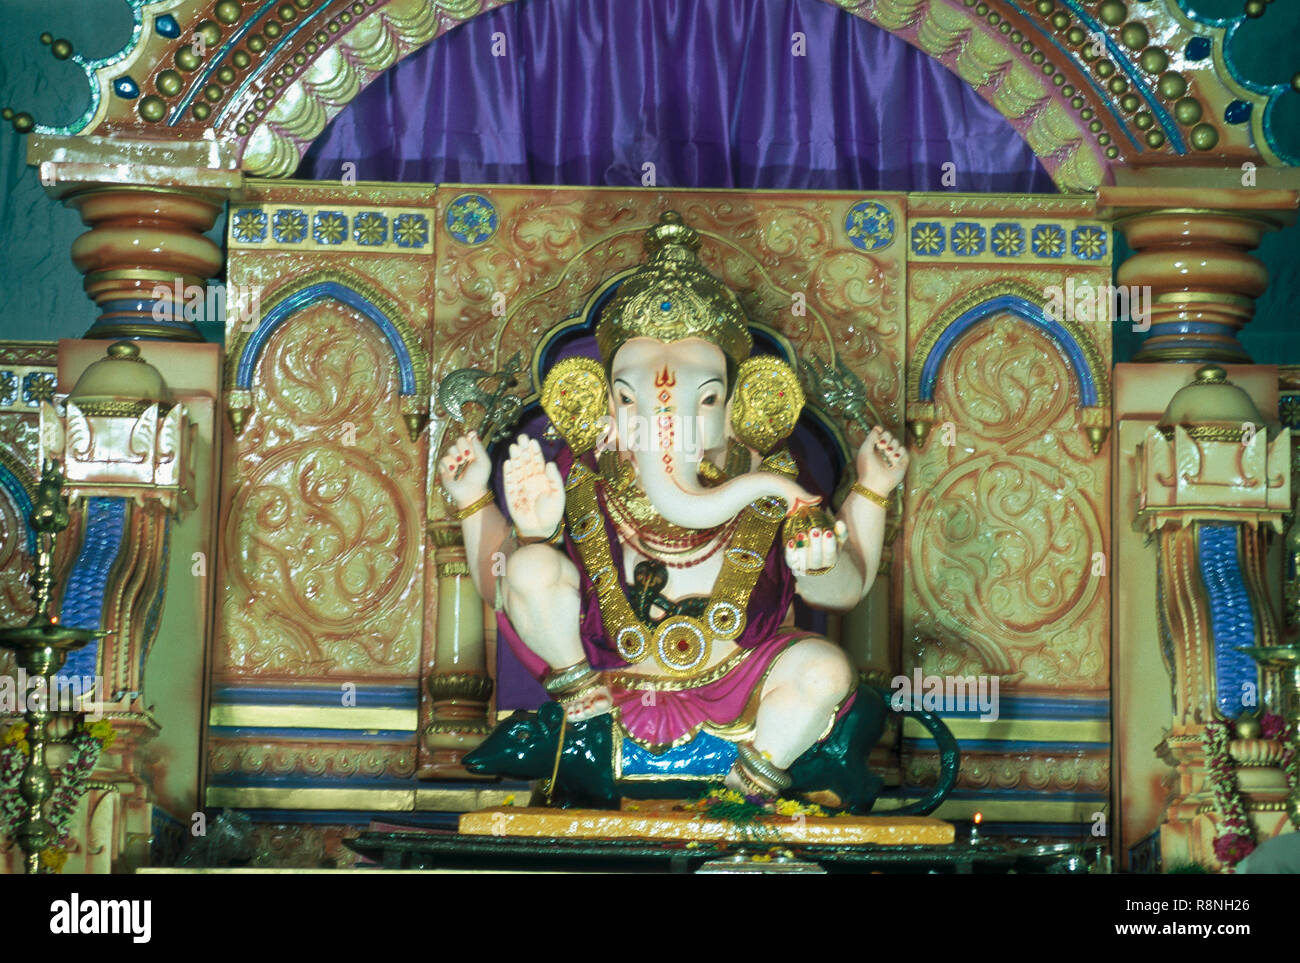 Guruji Stock Photos & Guruji Stock Images - Alamy